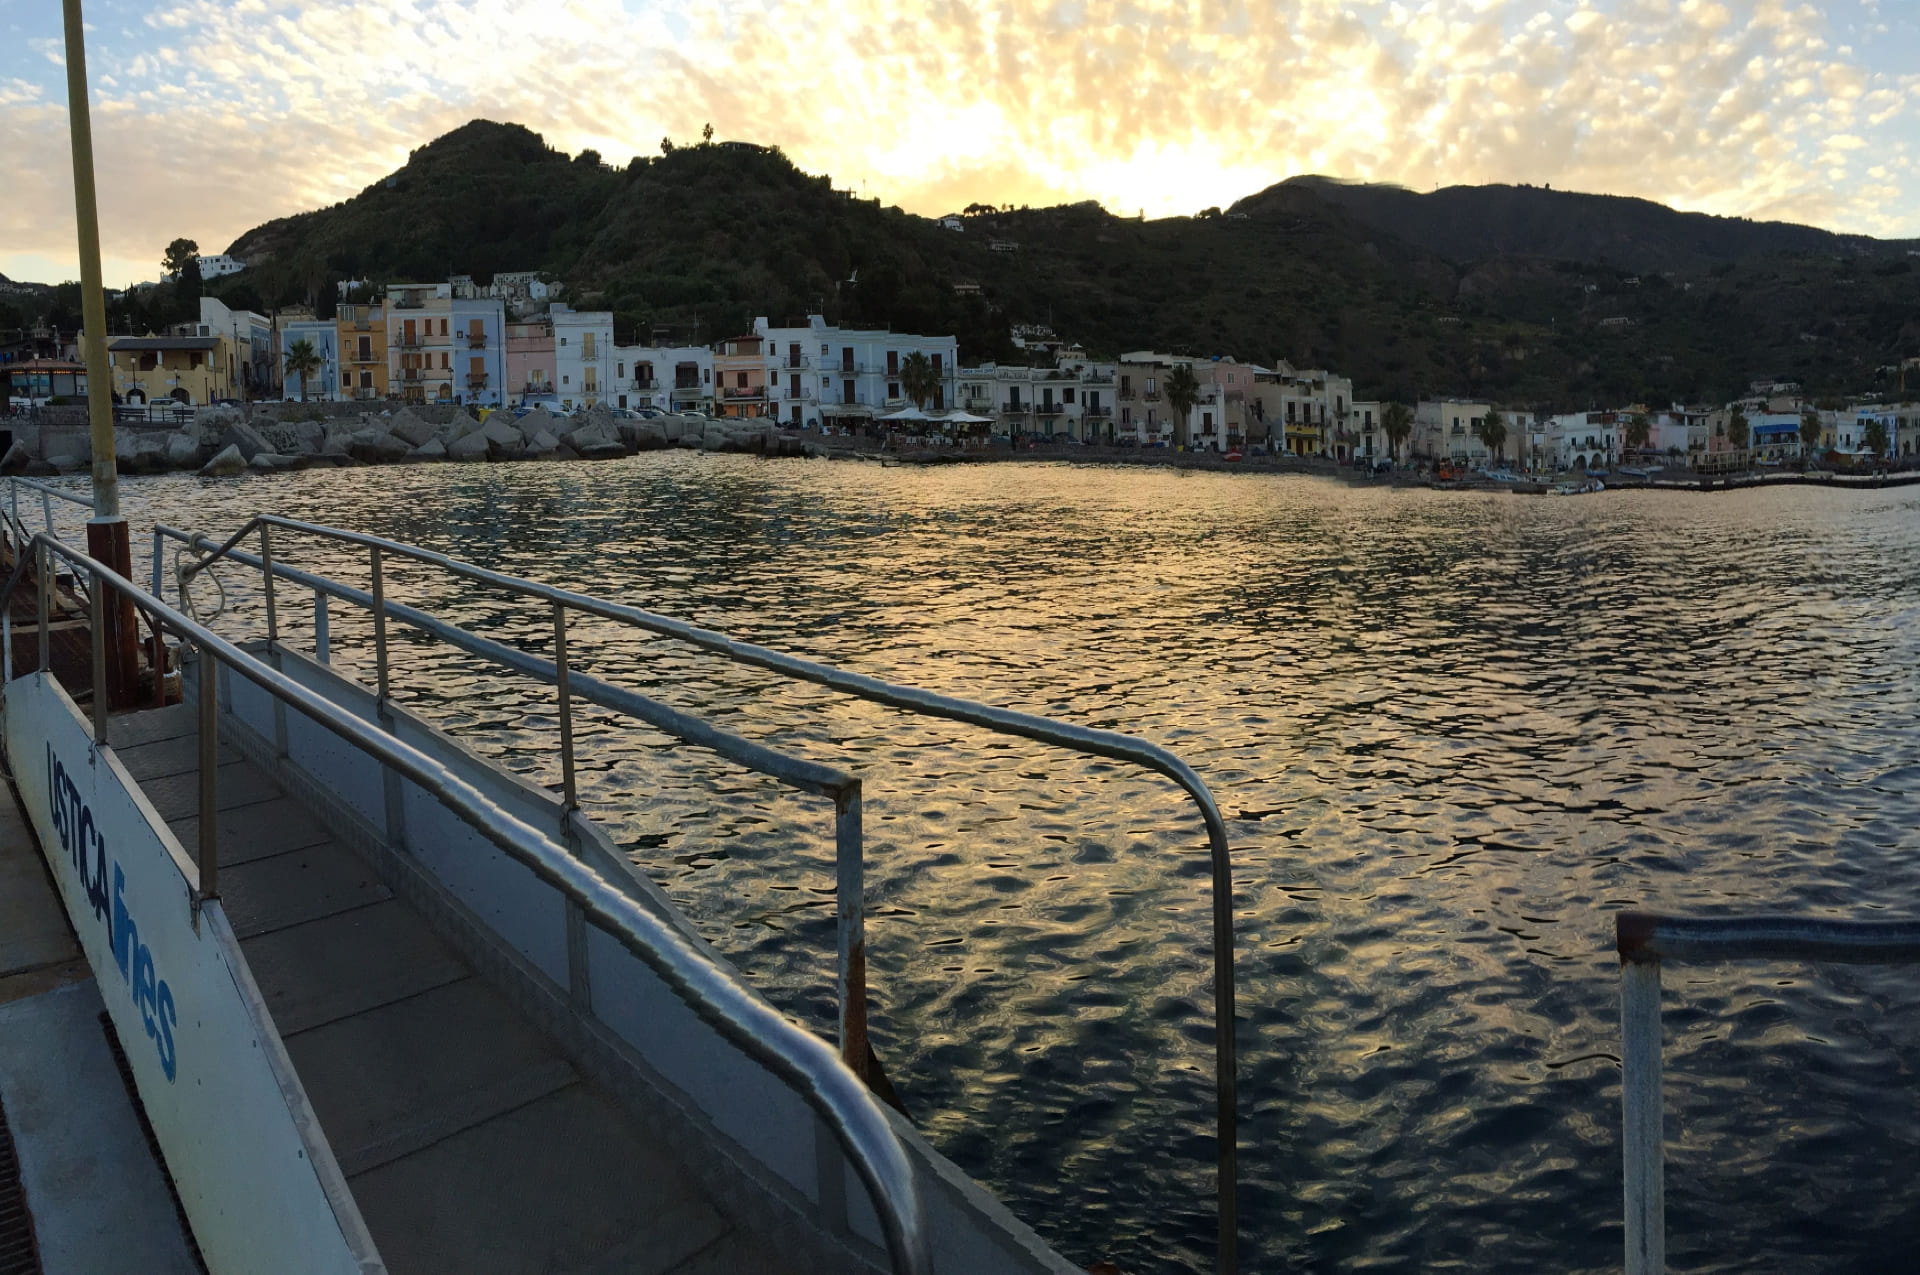 ferry_searoselipari_rl.jpg